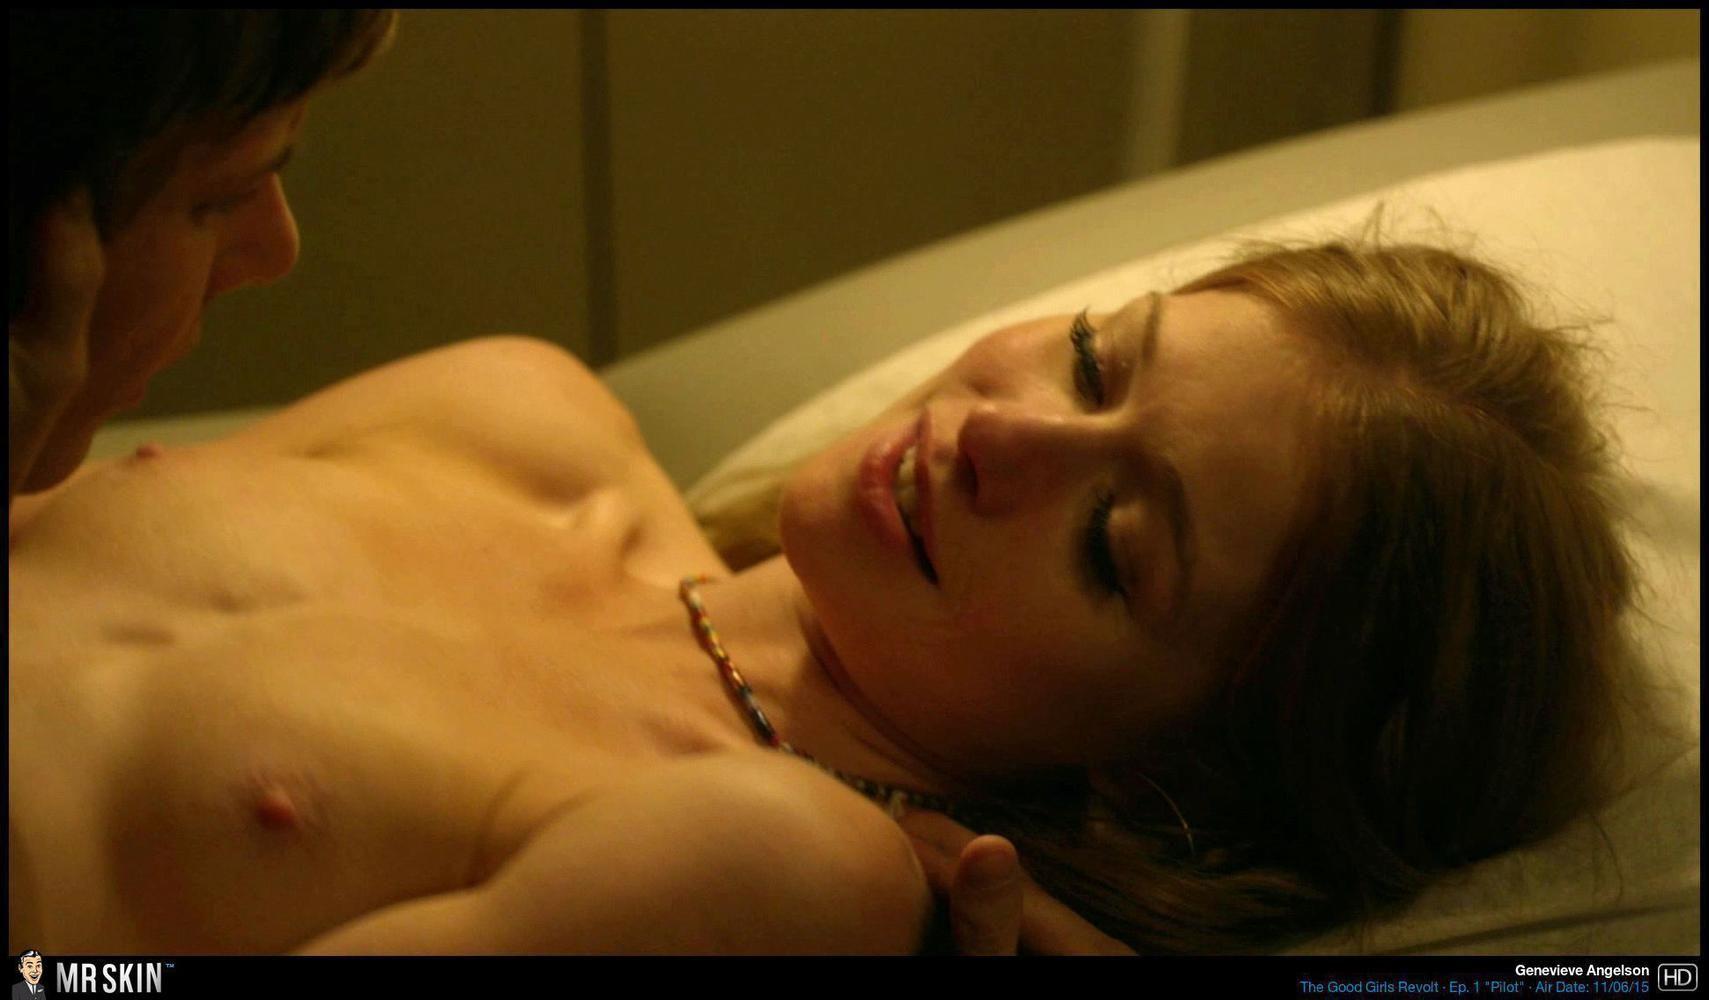 Brooke deepthroat video